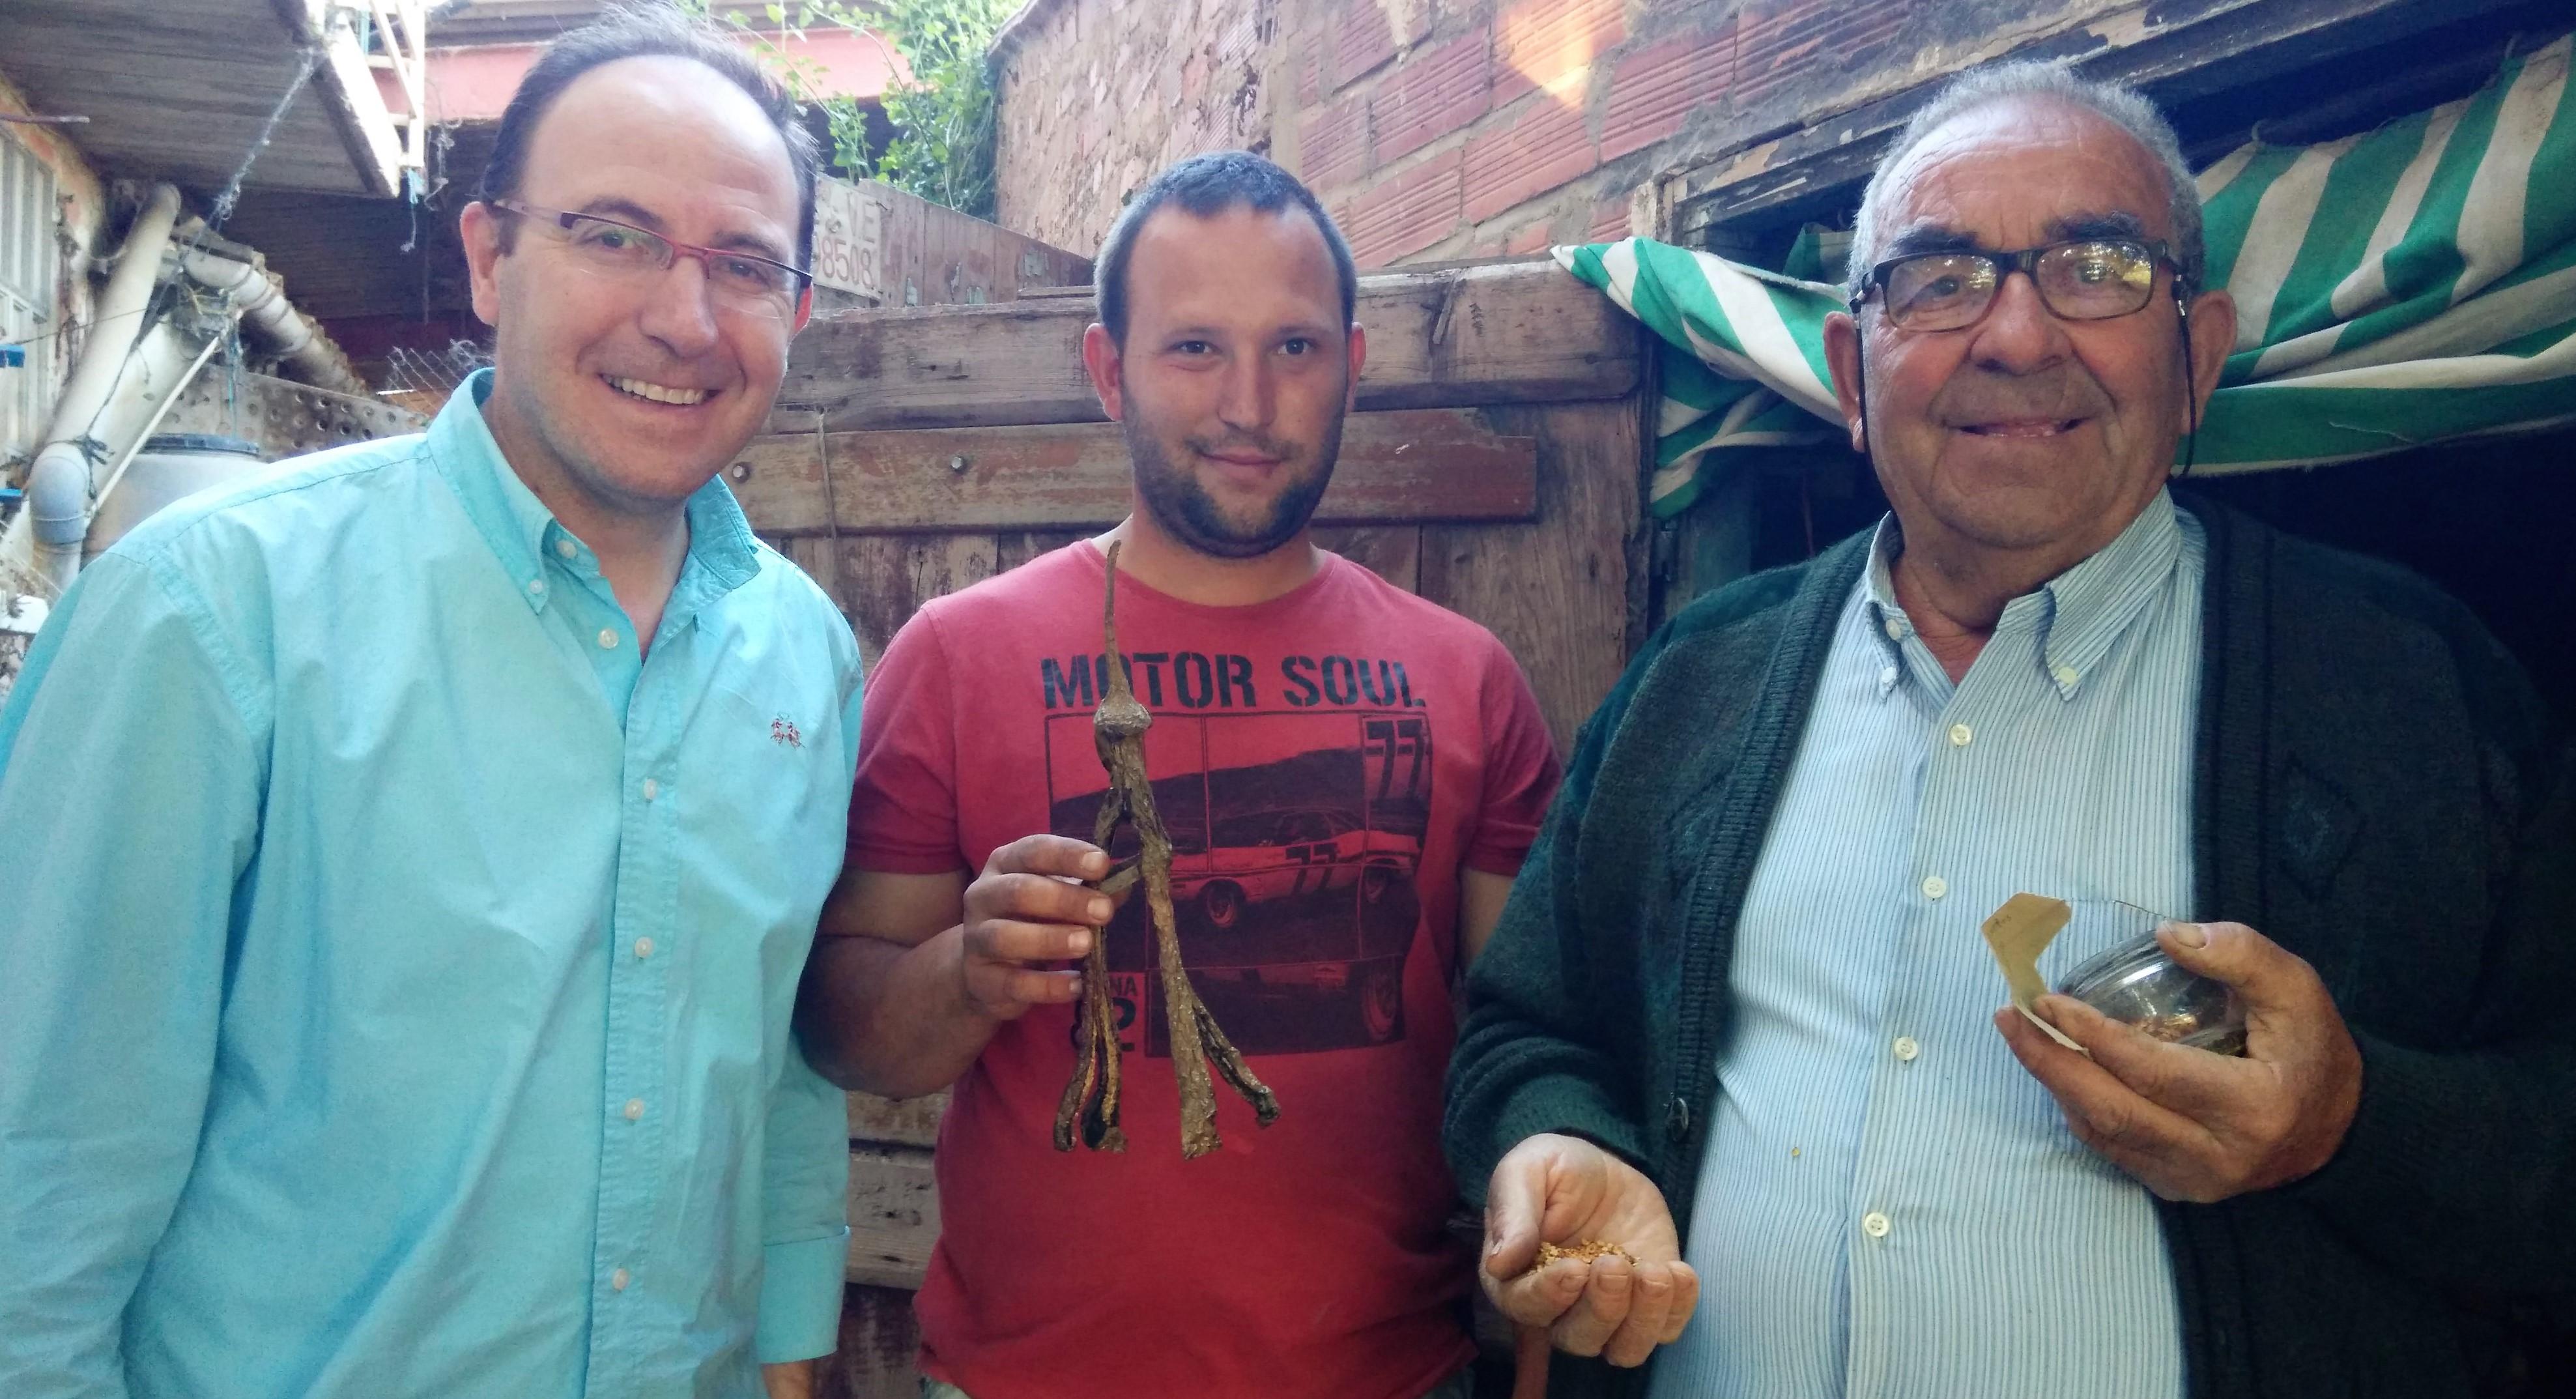 Prospectando semillas de la berenjena larga de Caspe EMILIO CORTÉS